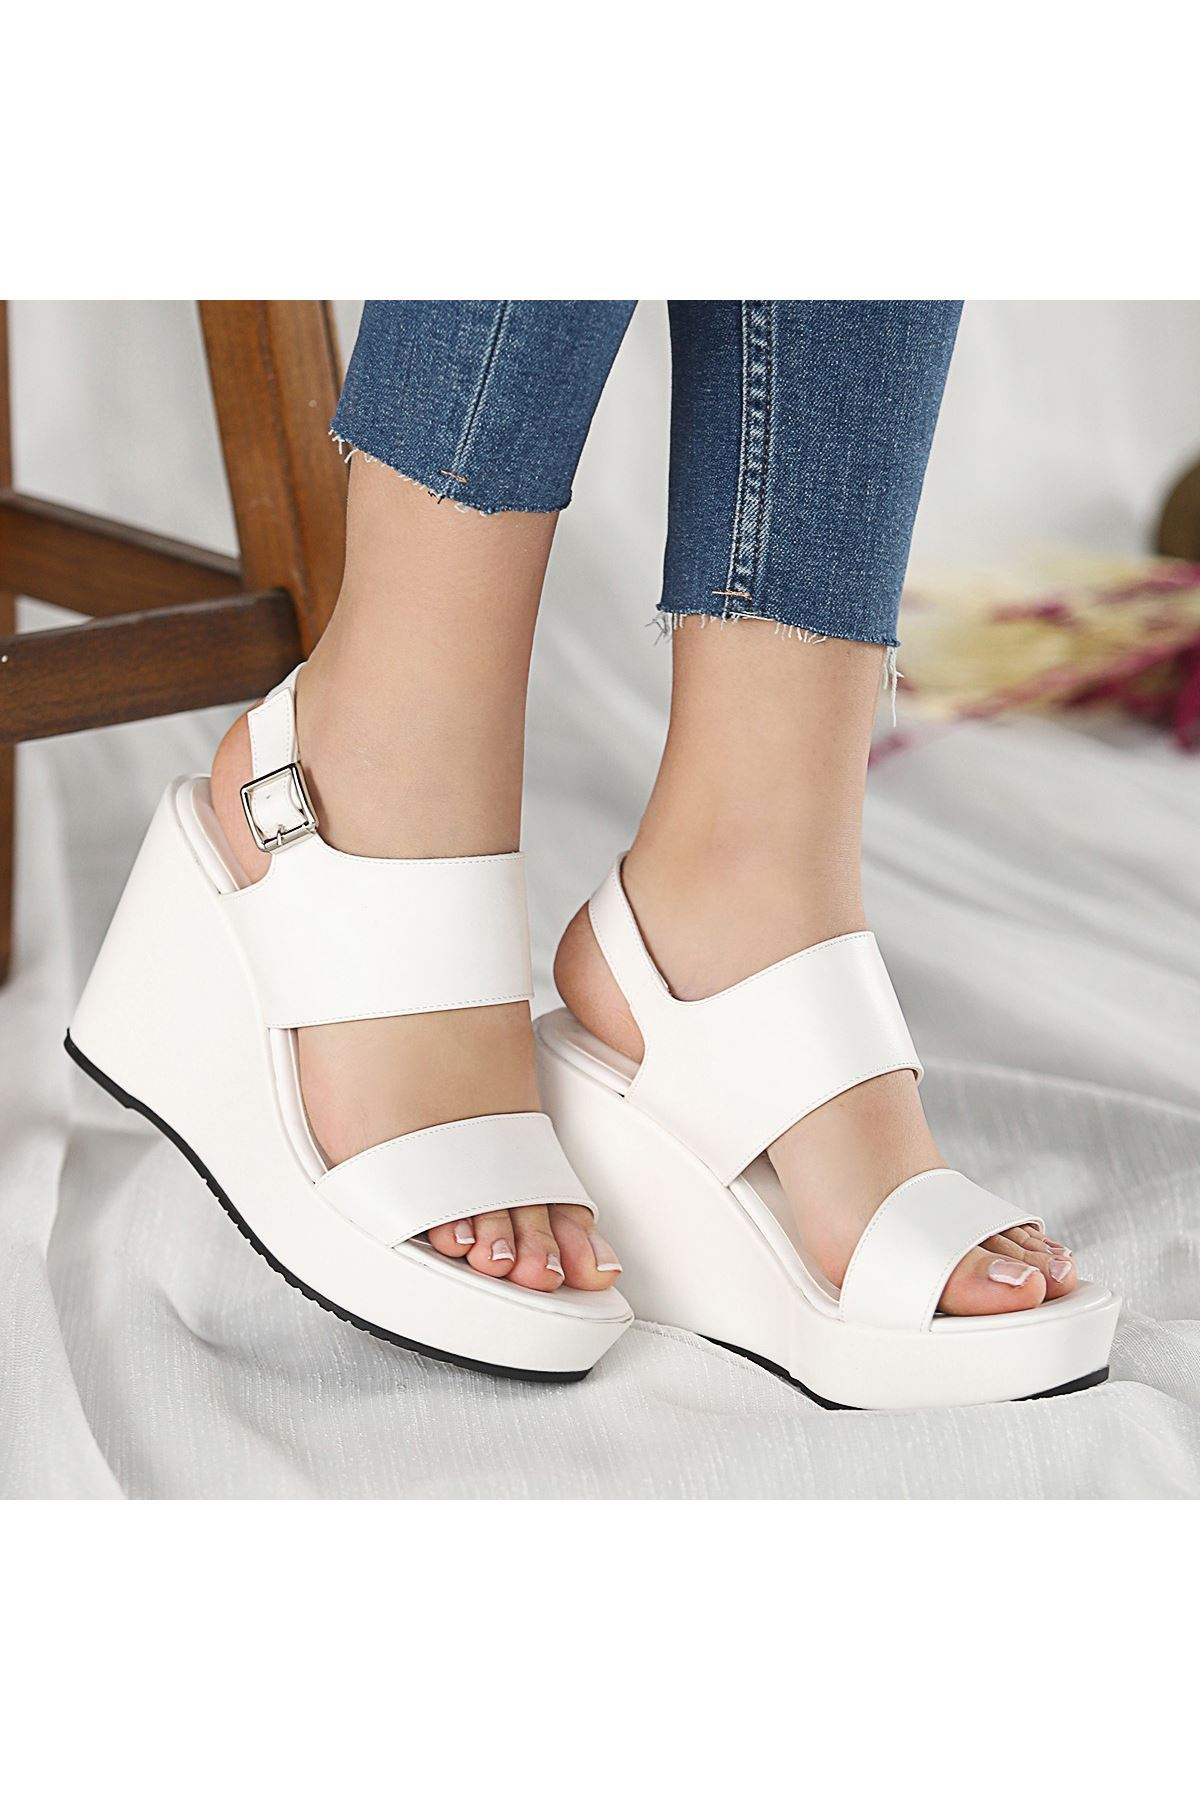 Rvin Beyaz Cilt Dolgu Topuk Sandalet